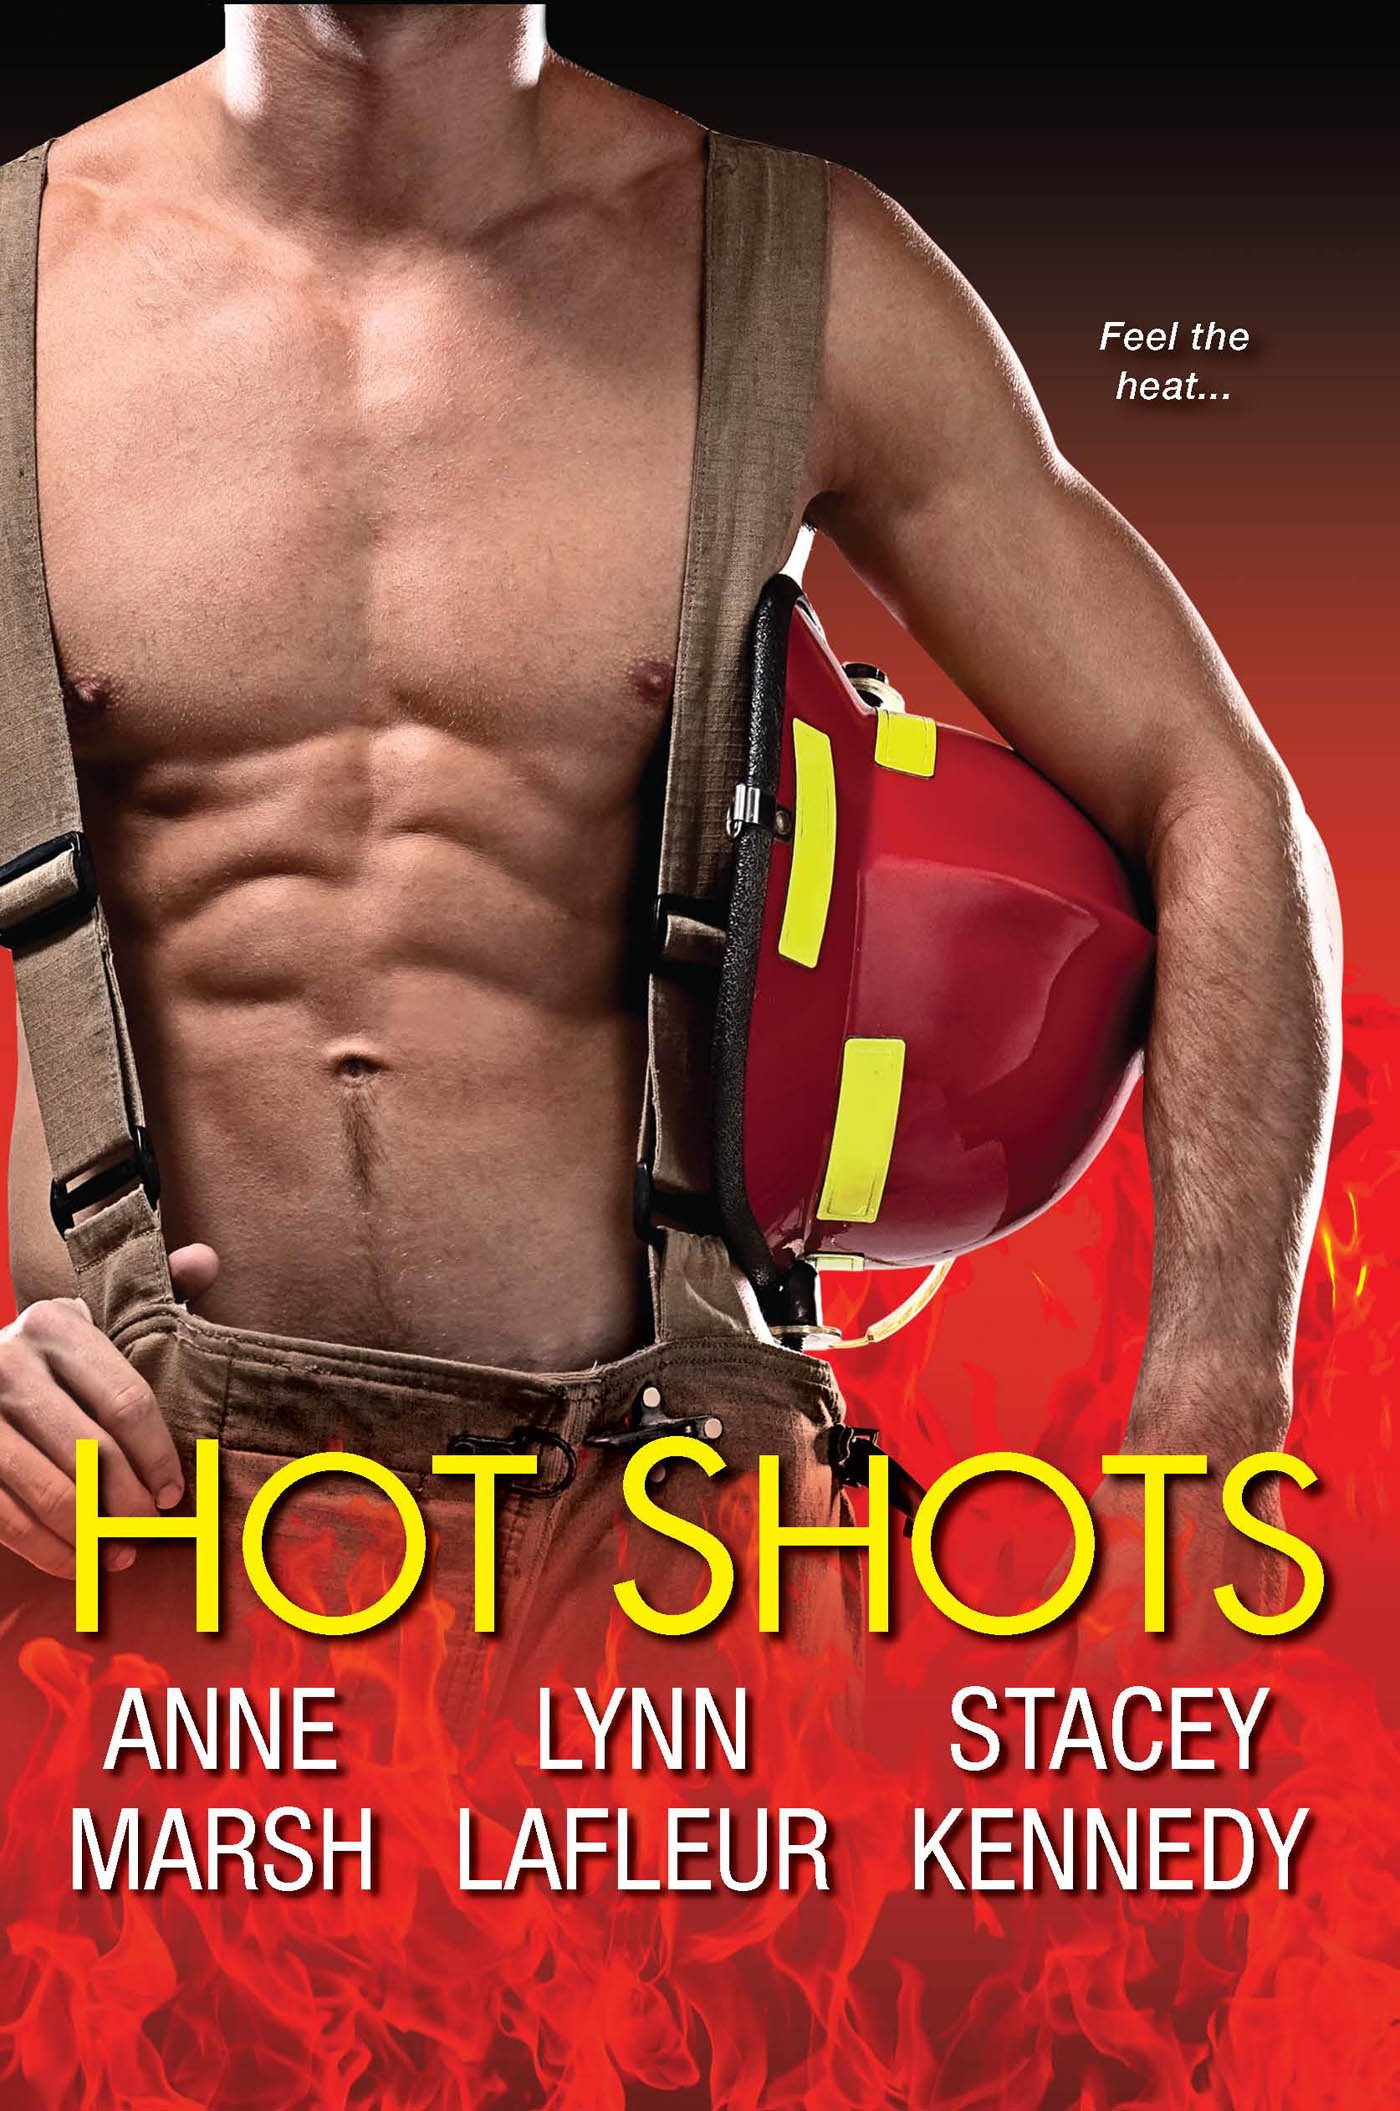 Hot Shots, Marsh, Anne & LaFleur, Lynn & Kennedy, Stacey